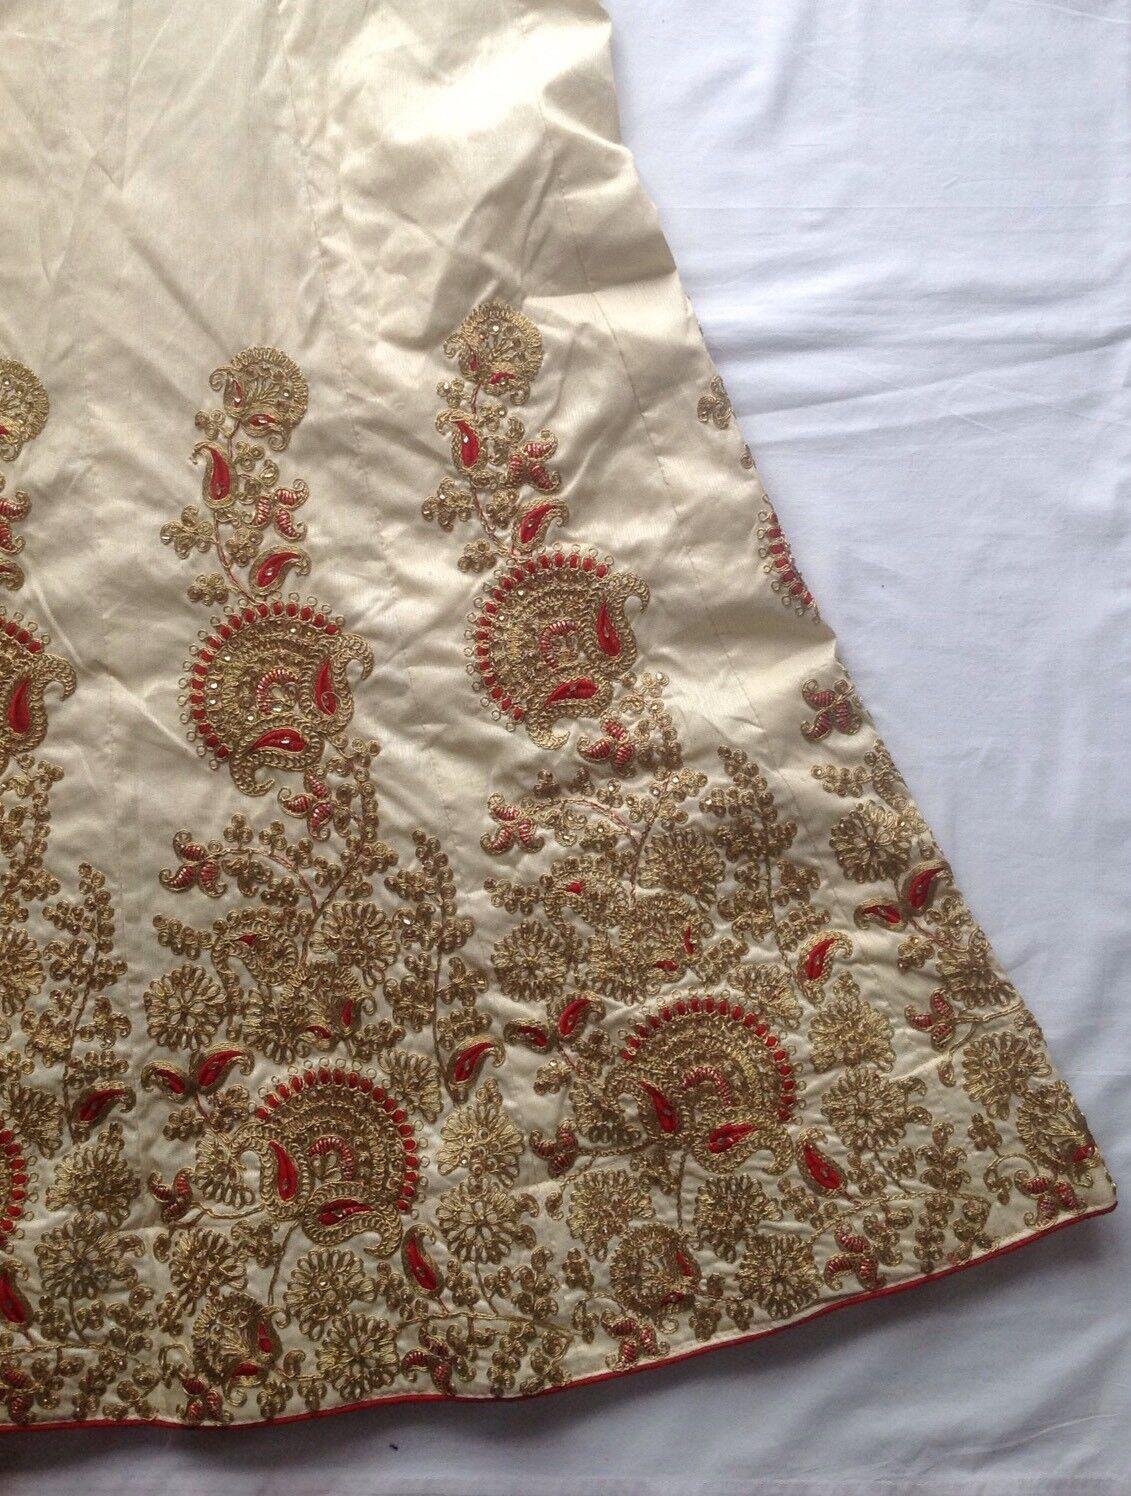 INDIAN Matrimonio lehnga quelli quelli quelli separati Camicetta Designer abito da sposa matrimonio pakistano 1d4da9